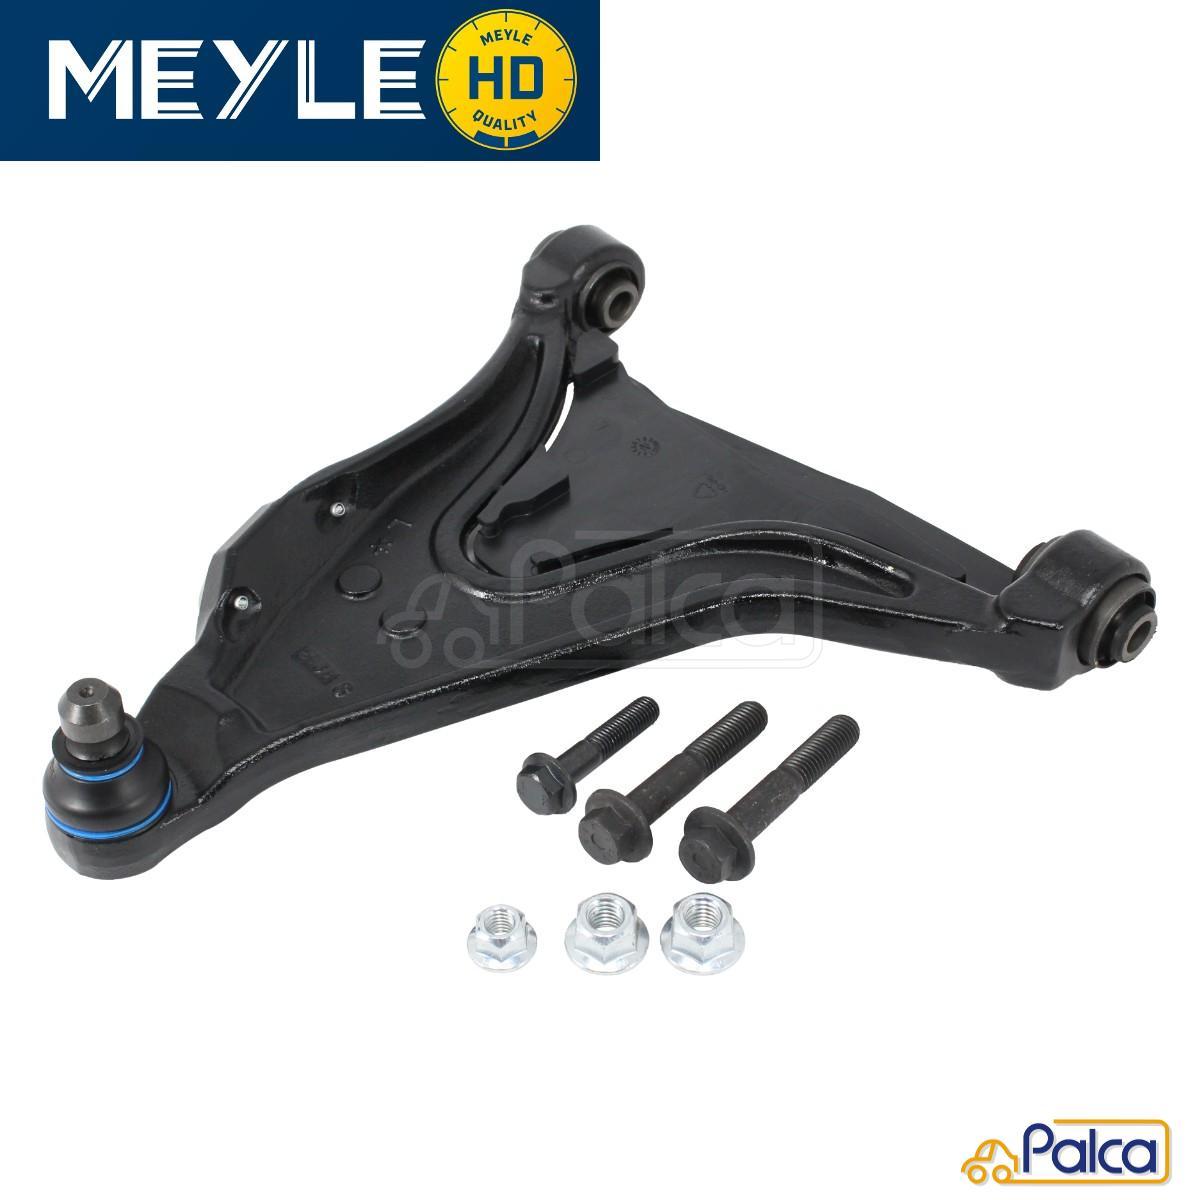 MEYLE製 期間限定今なら送料無料 新品 あす楽 ボルボ 左 超目玉 フロント コントロール S70 V70 ロアアーム 850 マイレ製 強化HDタイプ